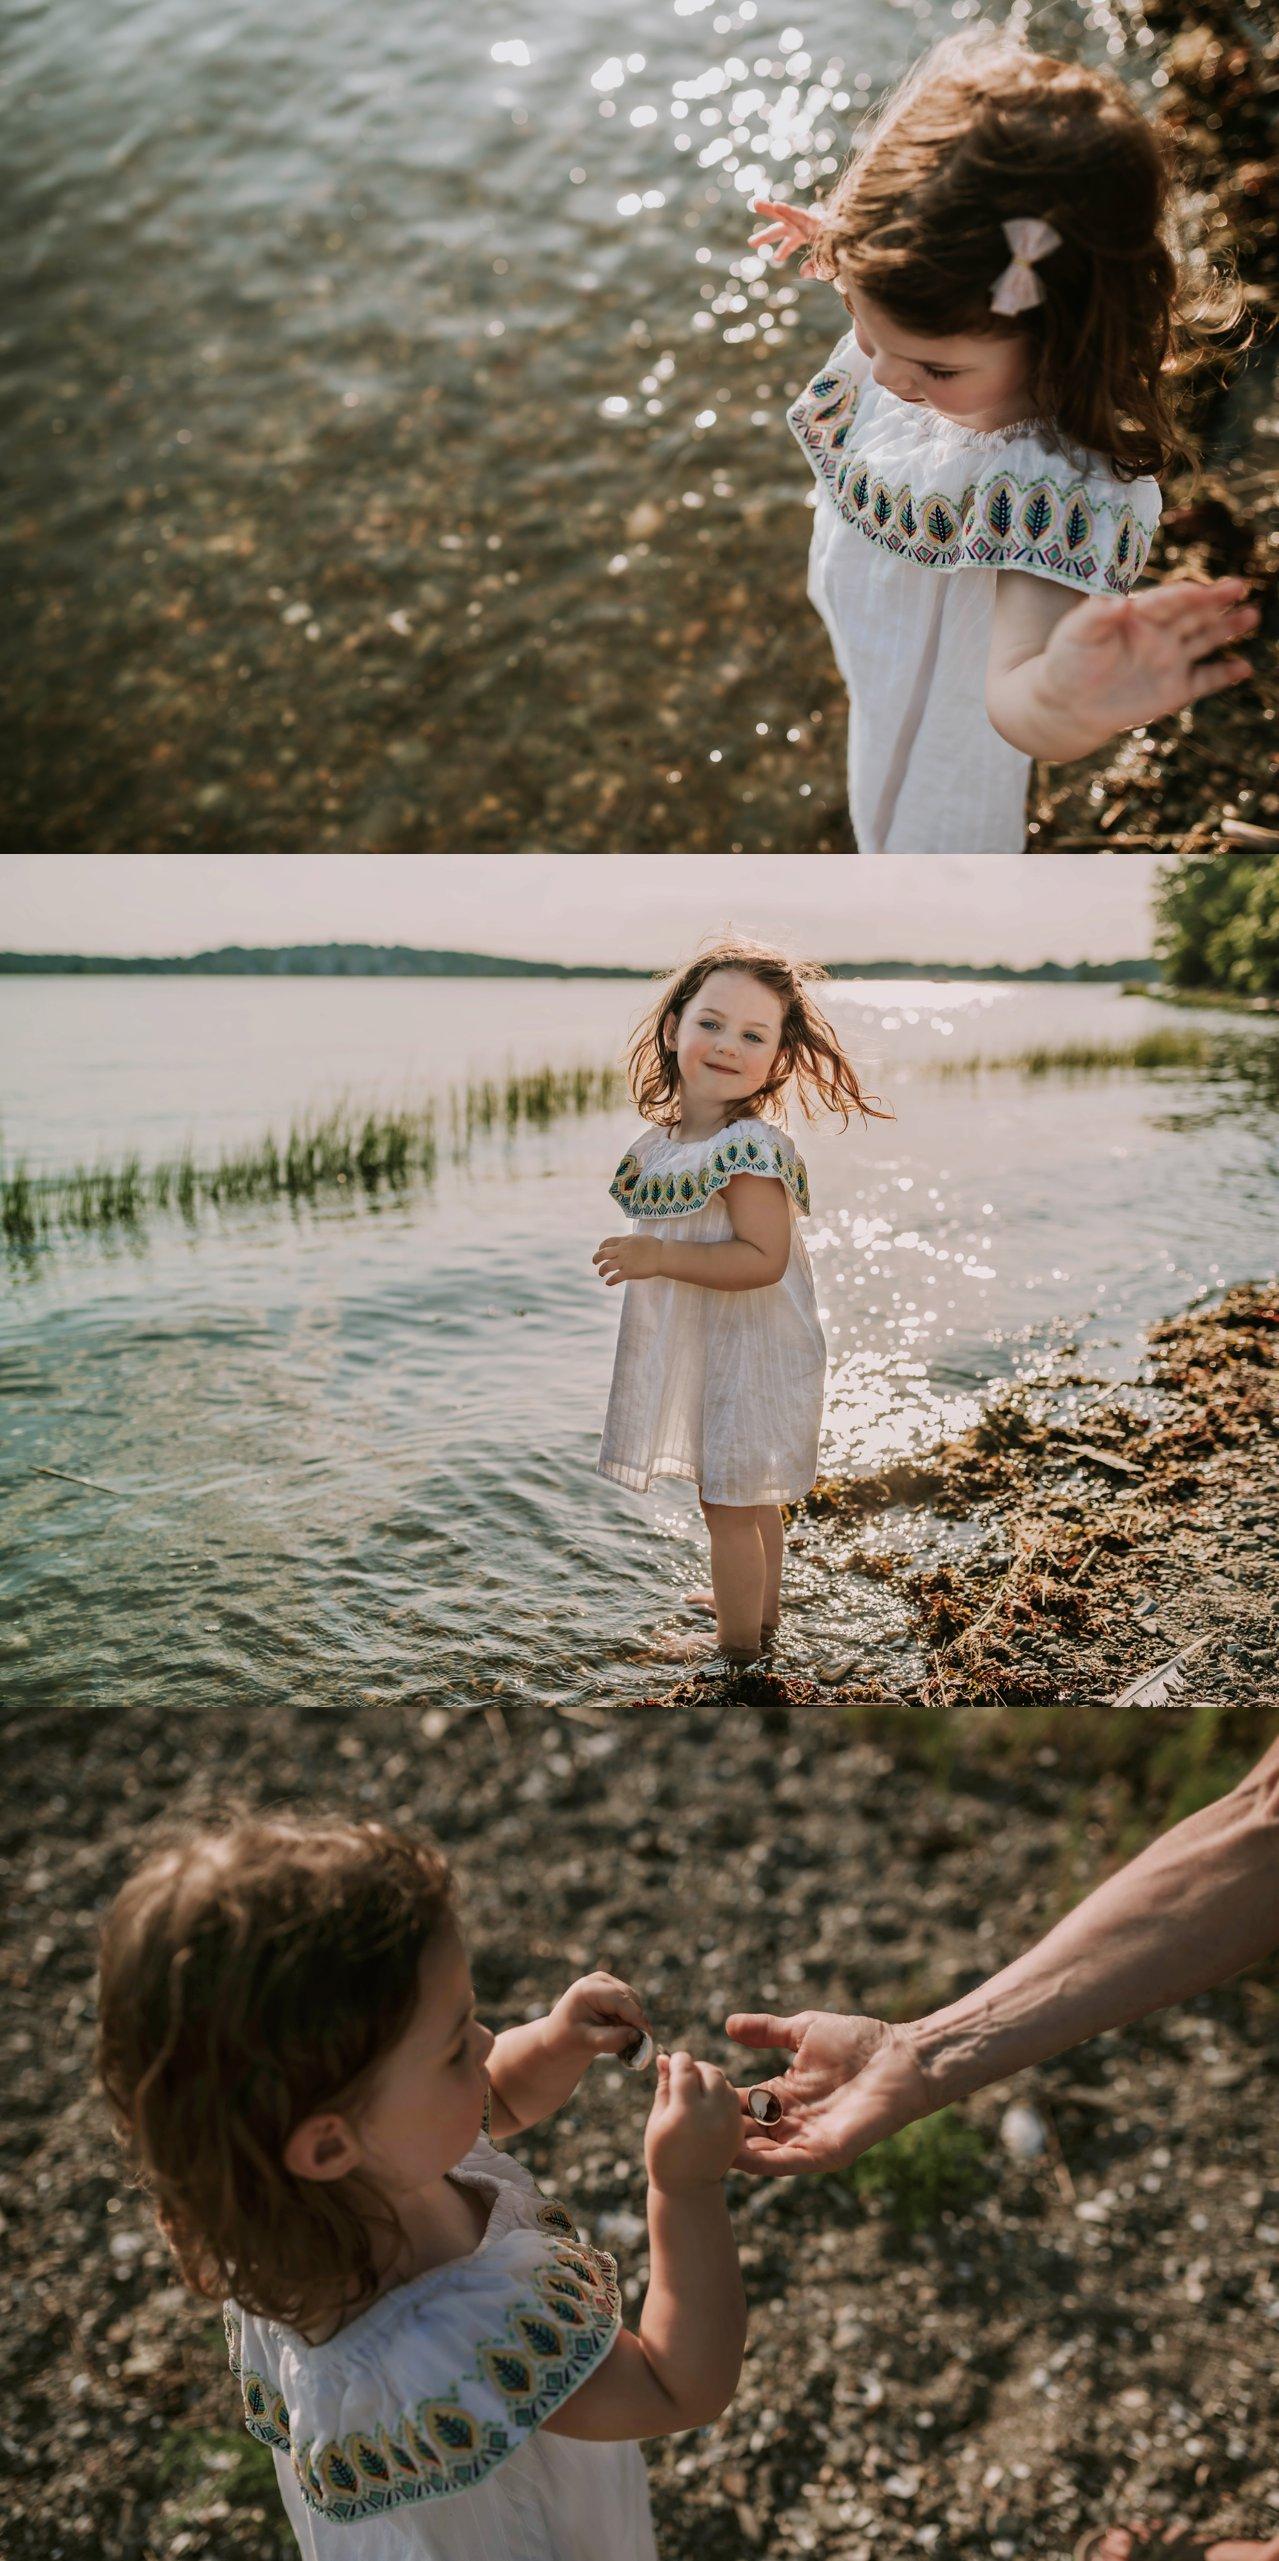 Summers_August_2018-155_Beautiful_Natural_Portraits_by_Award_Winning_Boston_Massachusetts_Family_Portrait_Photographer_Asher_and_Oak_Photography.jpg